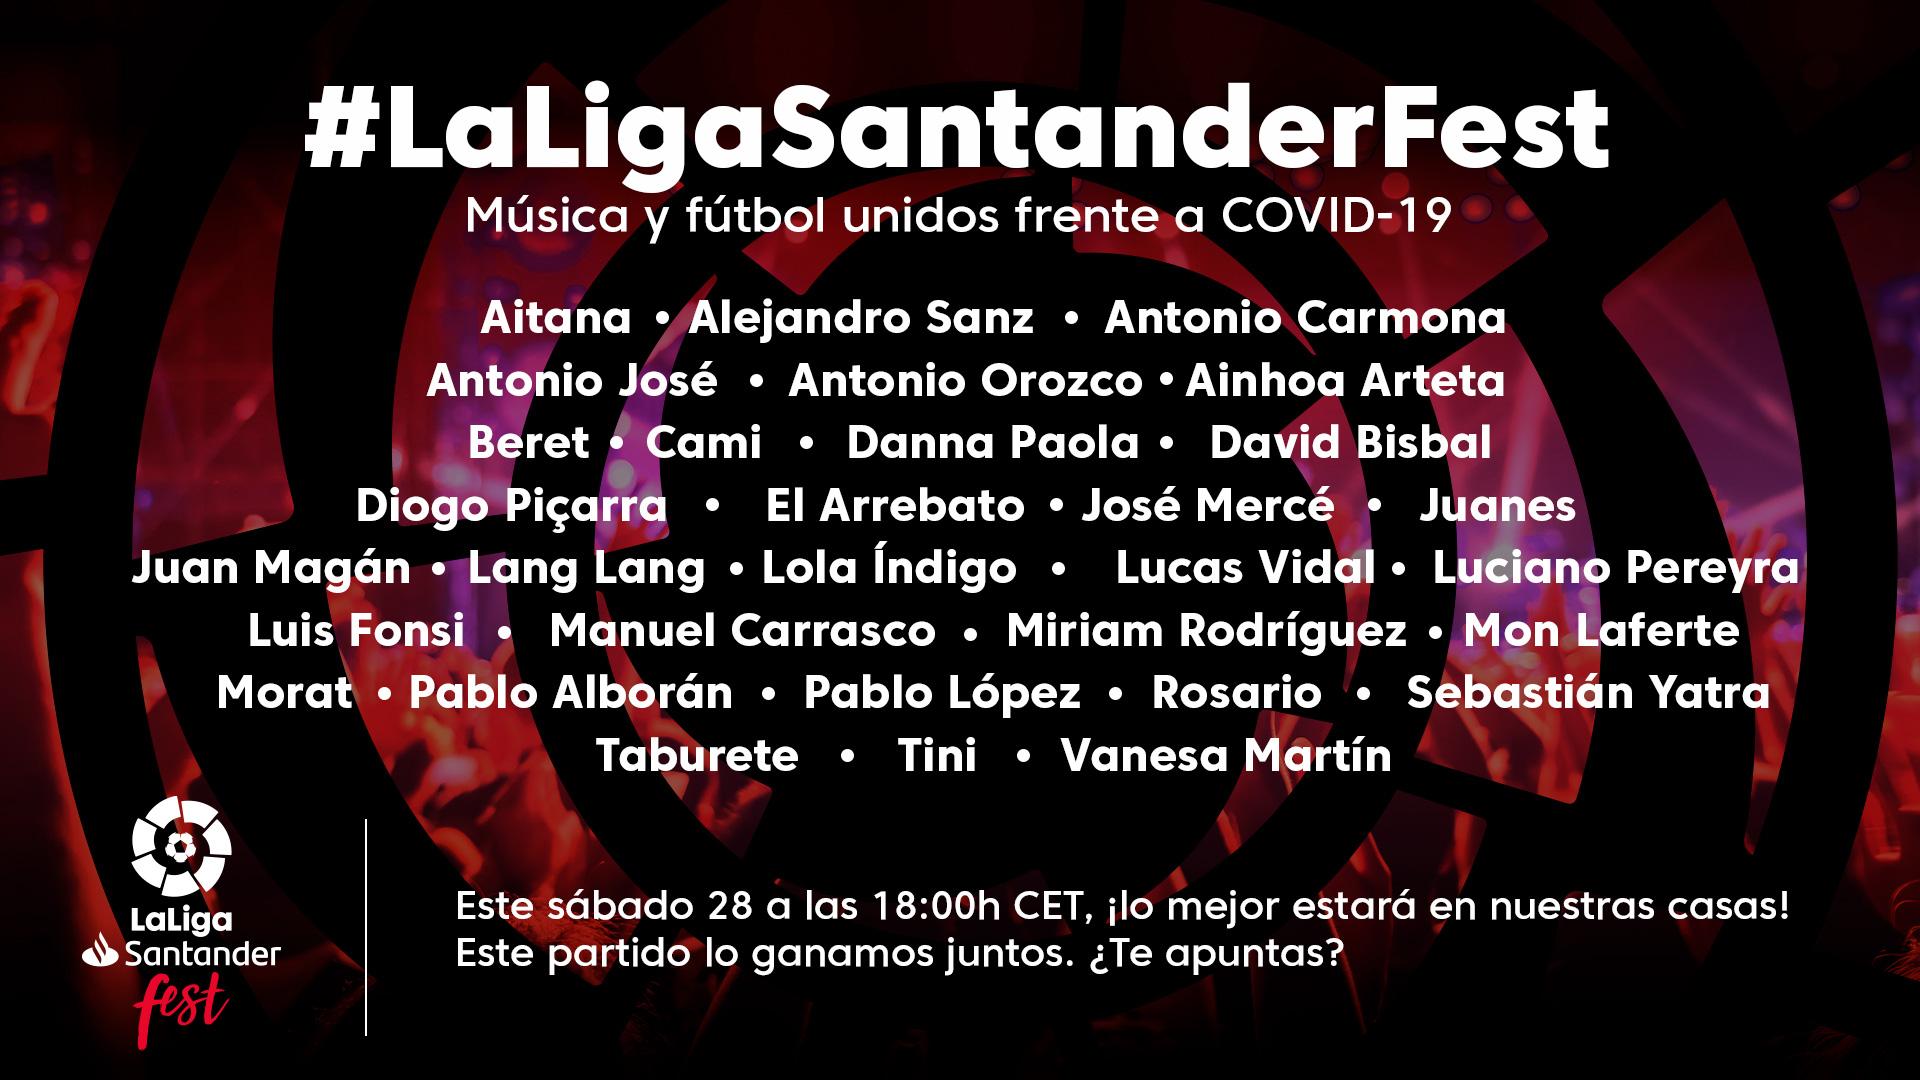 LaLigaSantander Festival la liga española